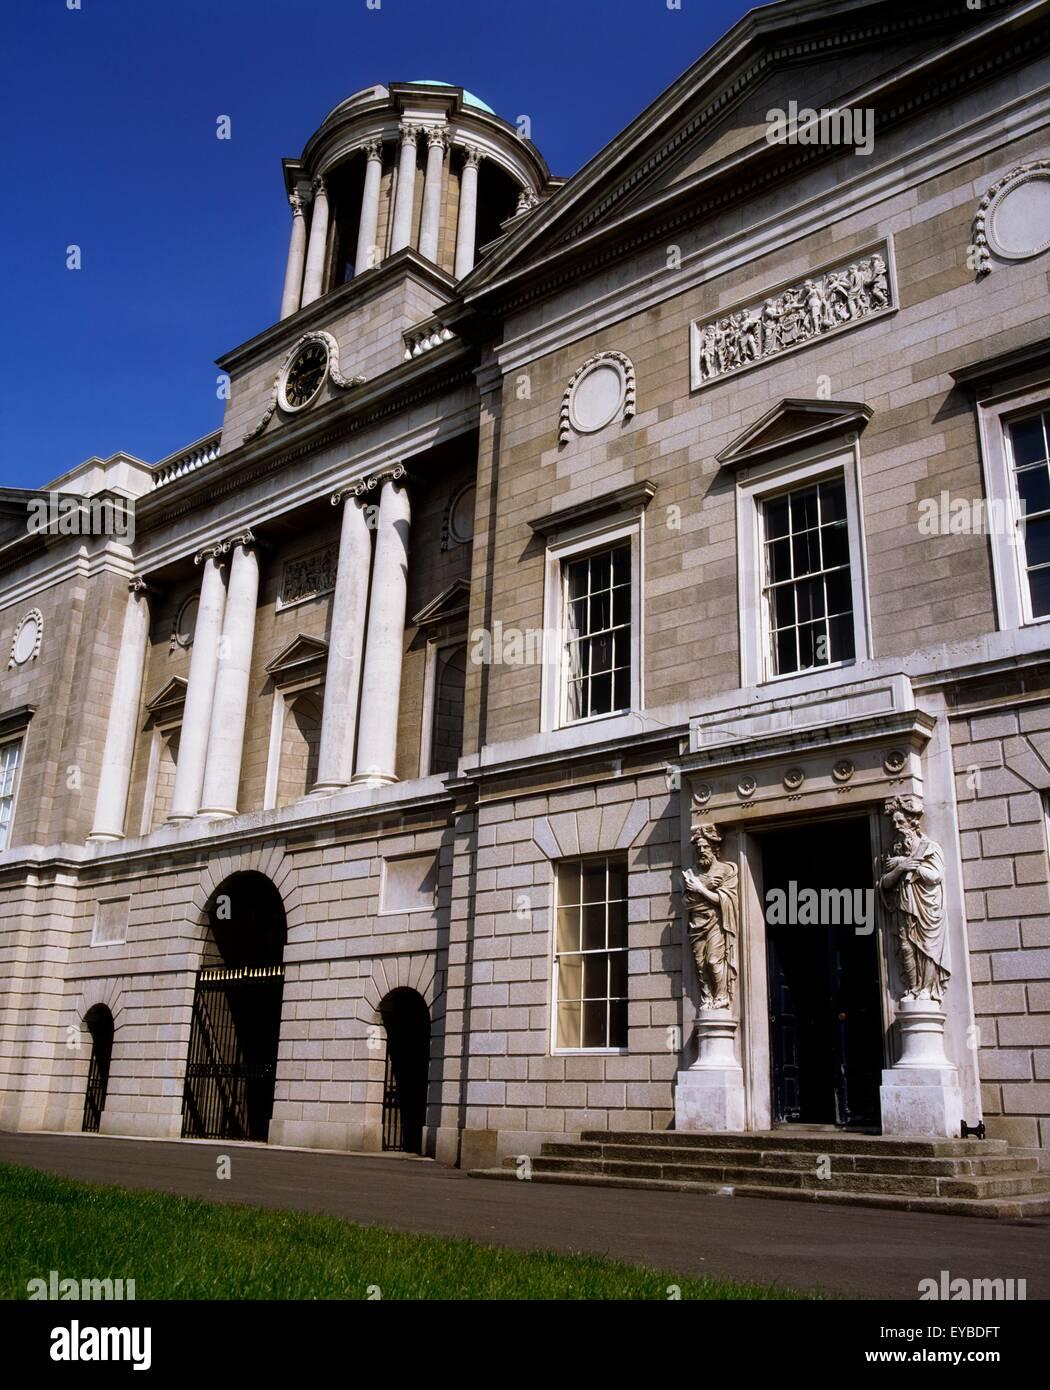 King's Inns, Boltan Street, Dublin, Co Dublin, Ireland; Building Designed By James Gandon In The 19Th Century - Stock Image